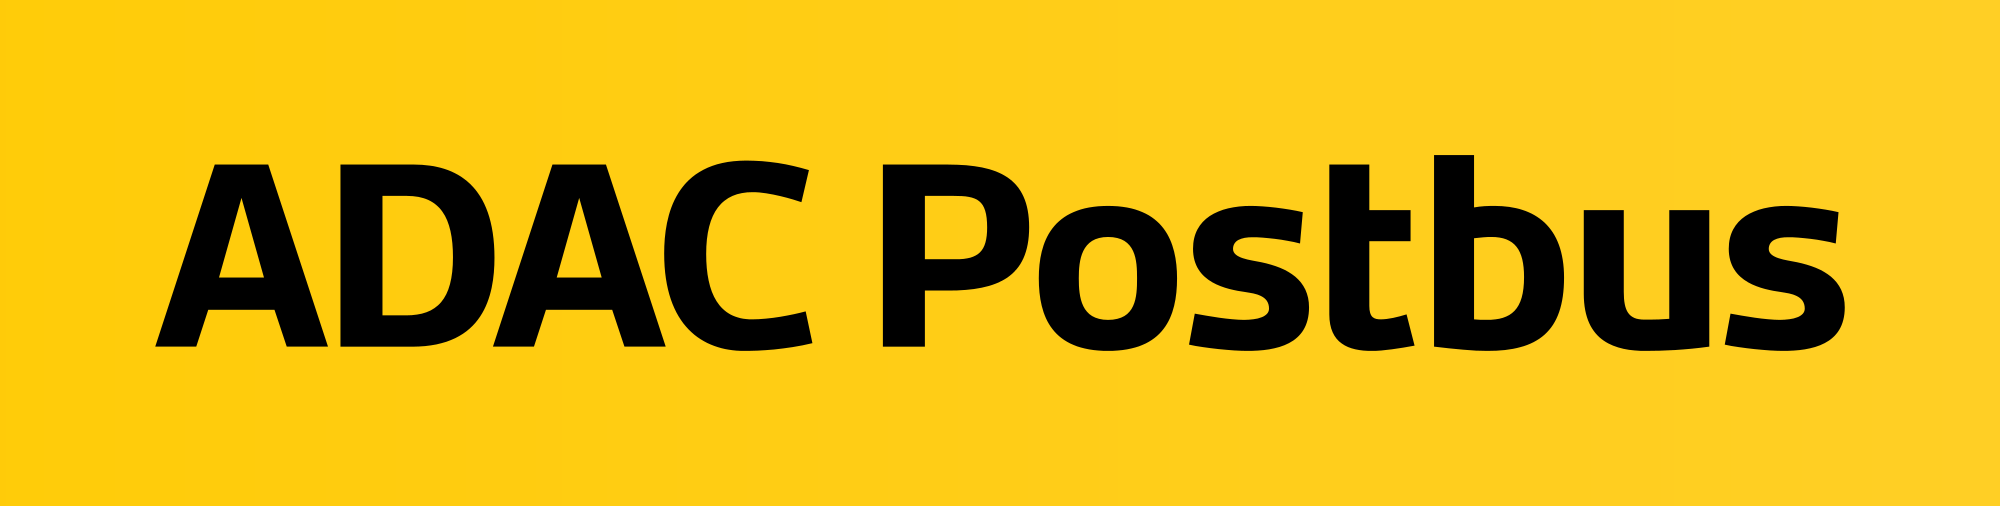 Adac Postbus Logo - Adac Logo Vector PNG - Adac Vector PNG